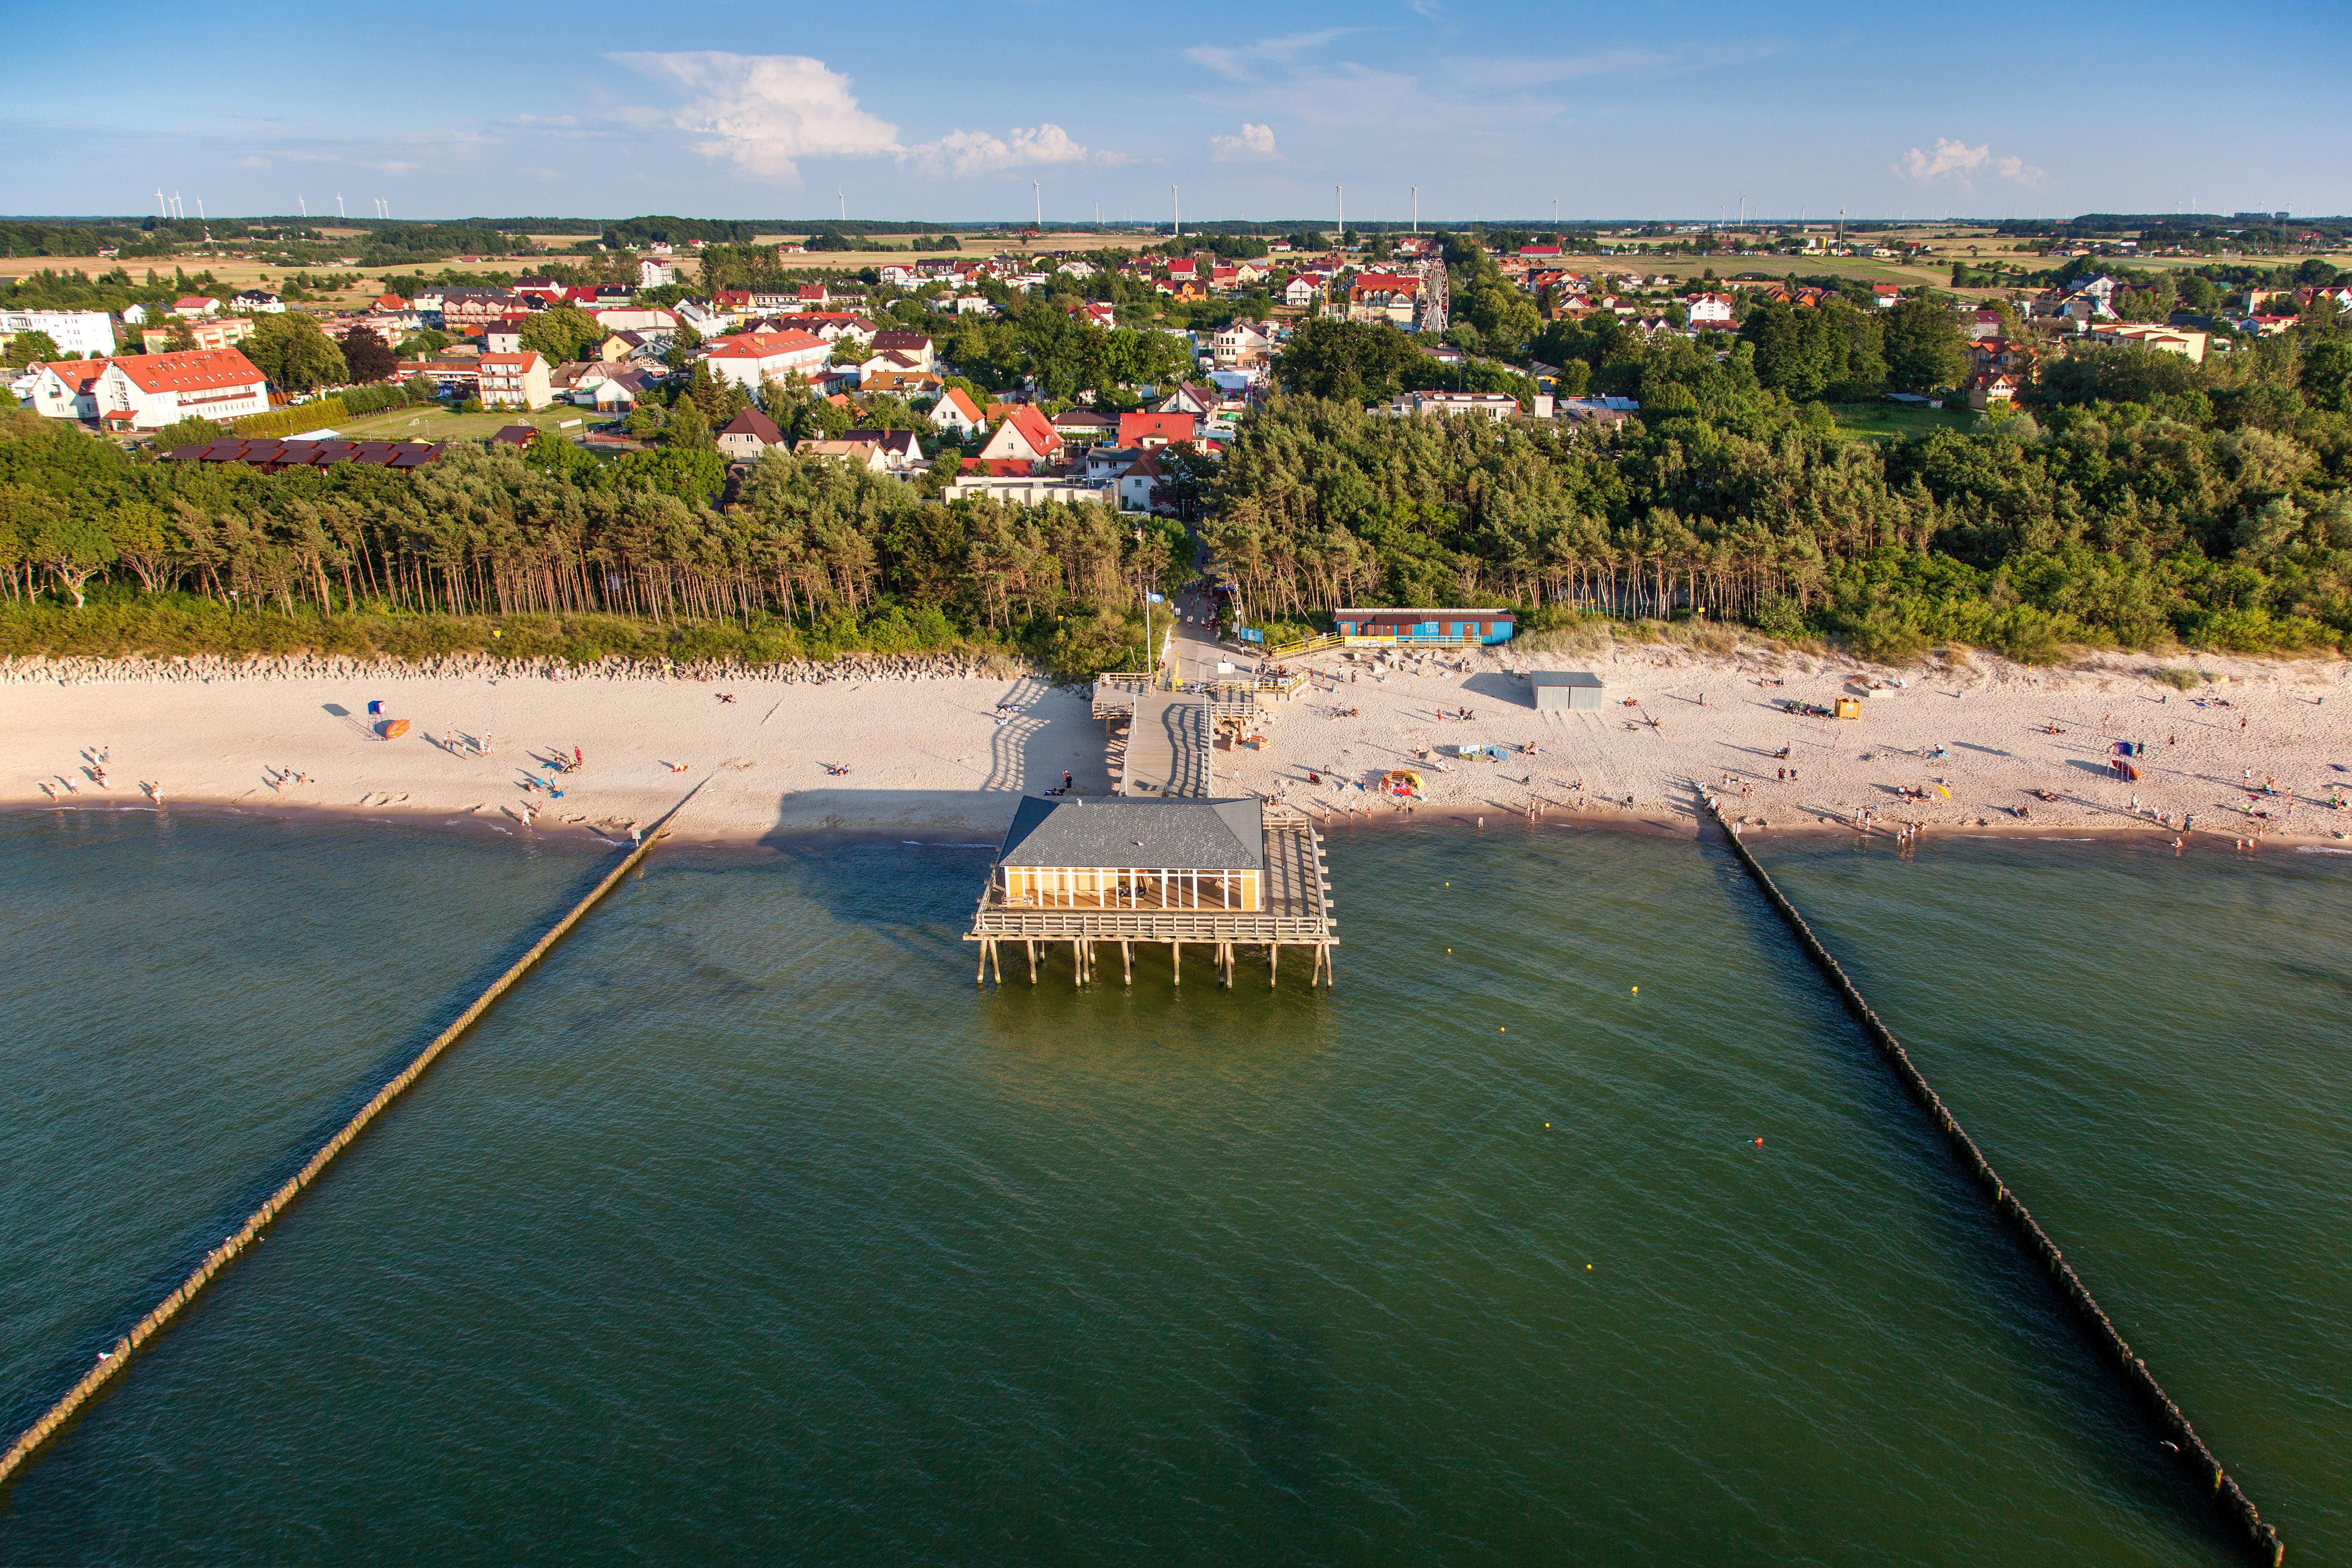 Ustronie Morskie, panorama na miejscowasc od strony morza. EU., Pl, Zachodniopomorskie. Lotnicze.